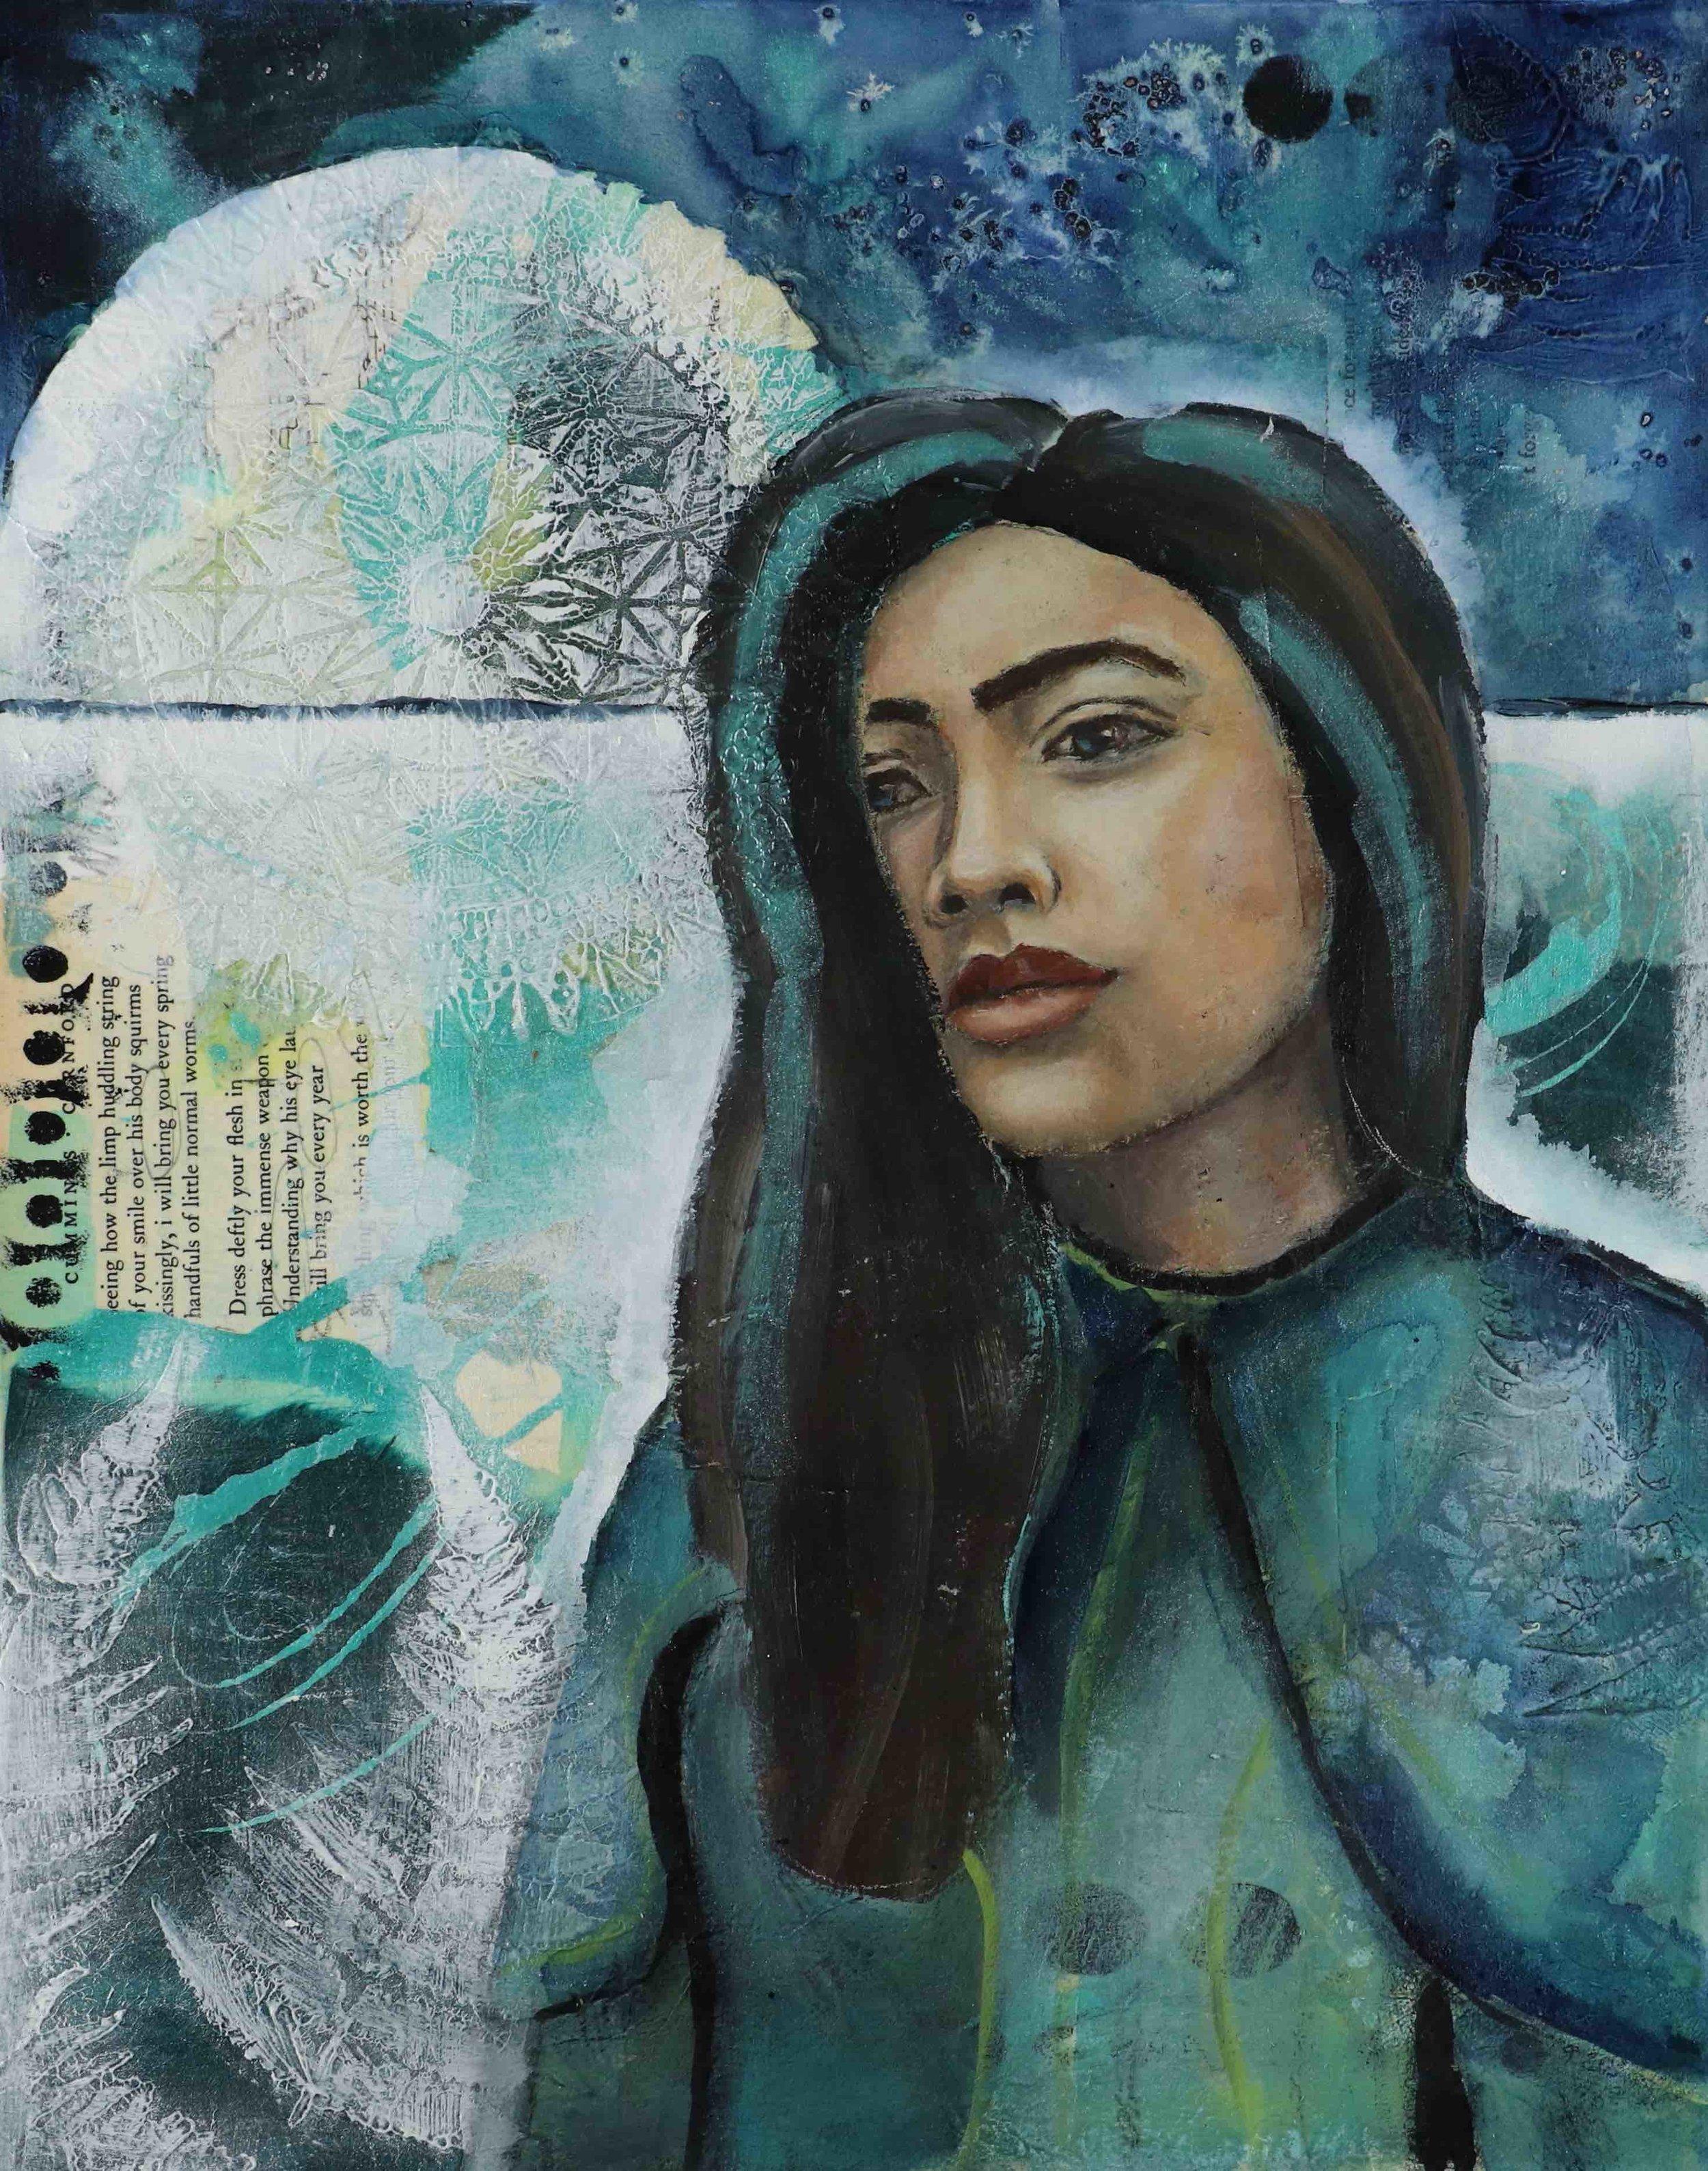 Her Big Adventure, art lesson by Melanie Rivers, 21 Secrets Face Time, an online art course